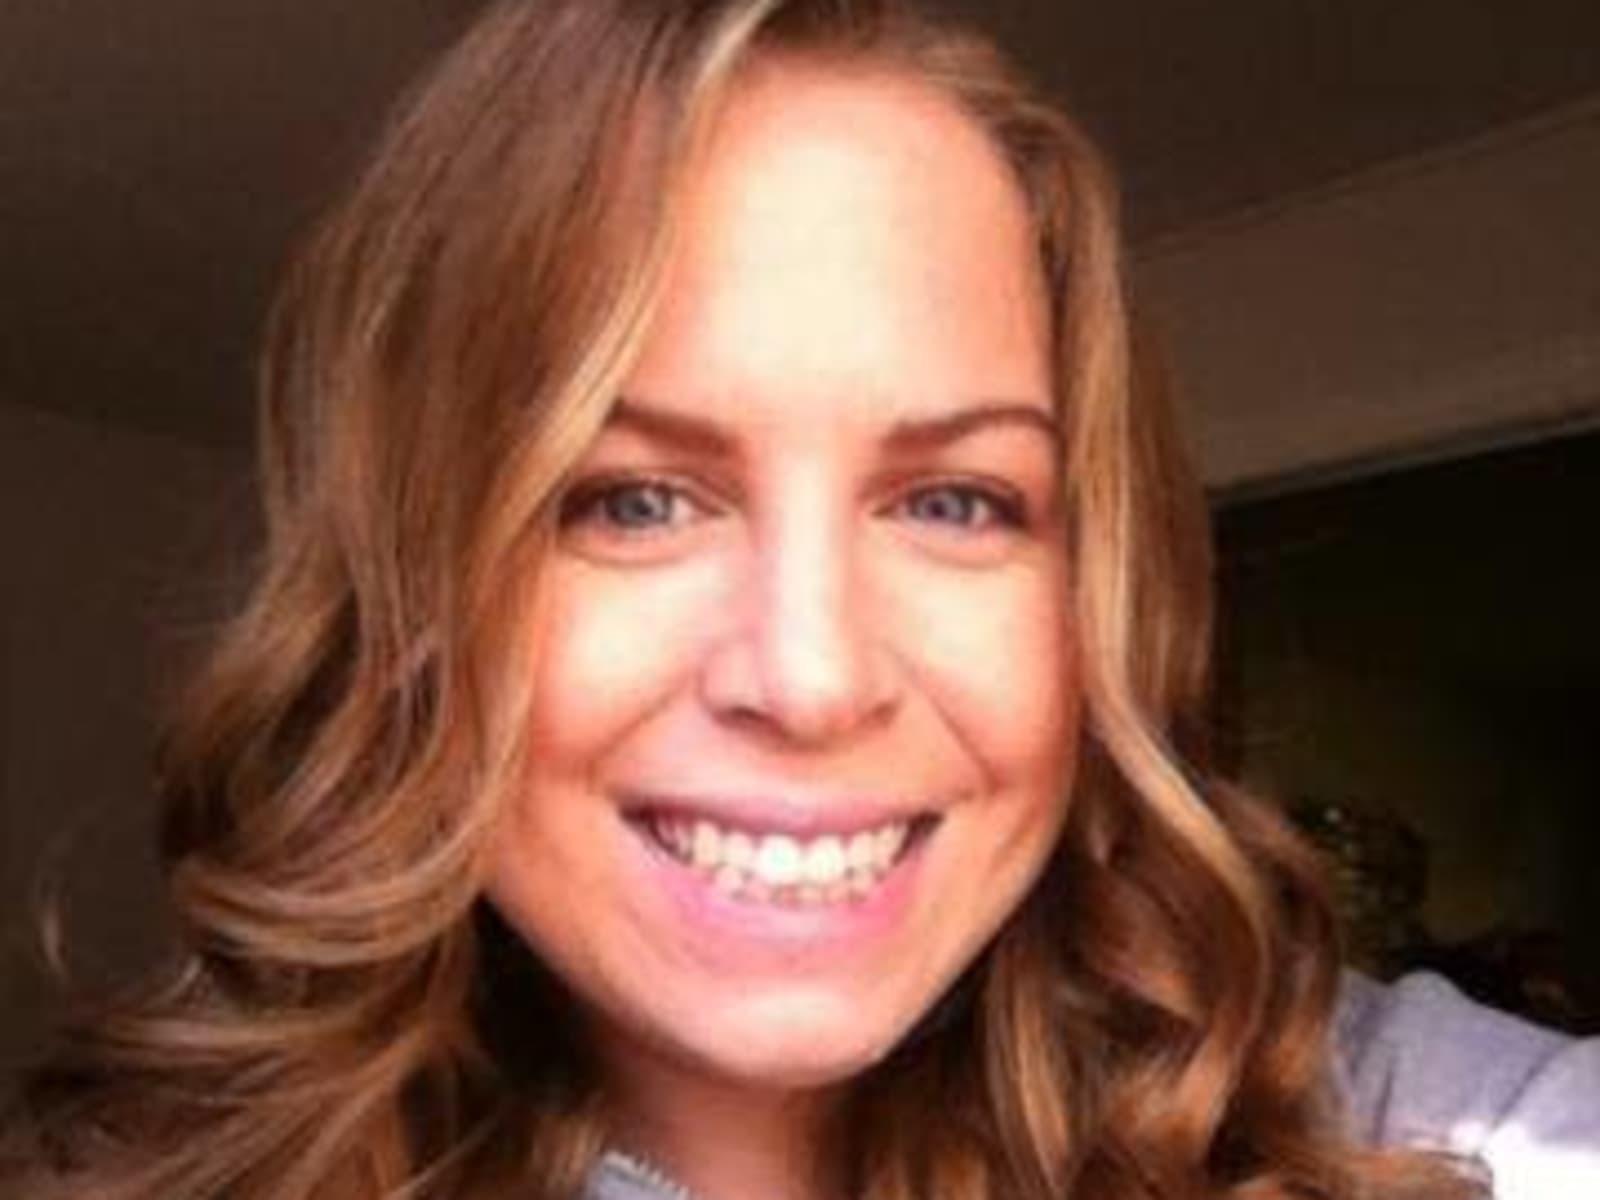 Heather from Sebastopol, California, United States